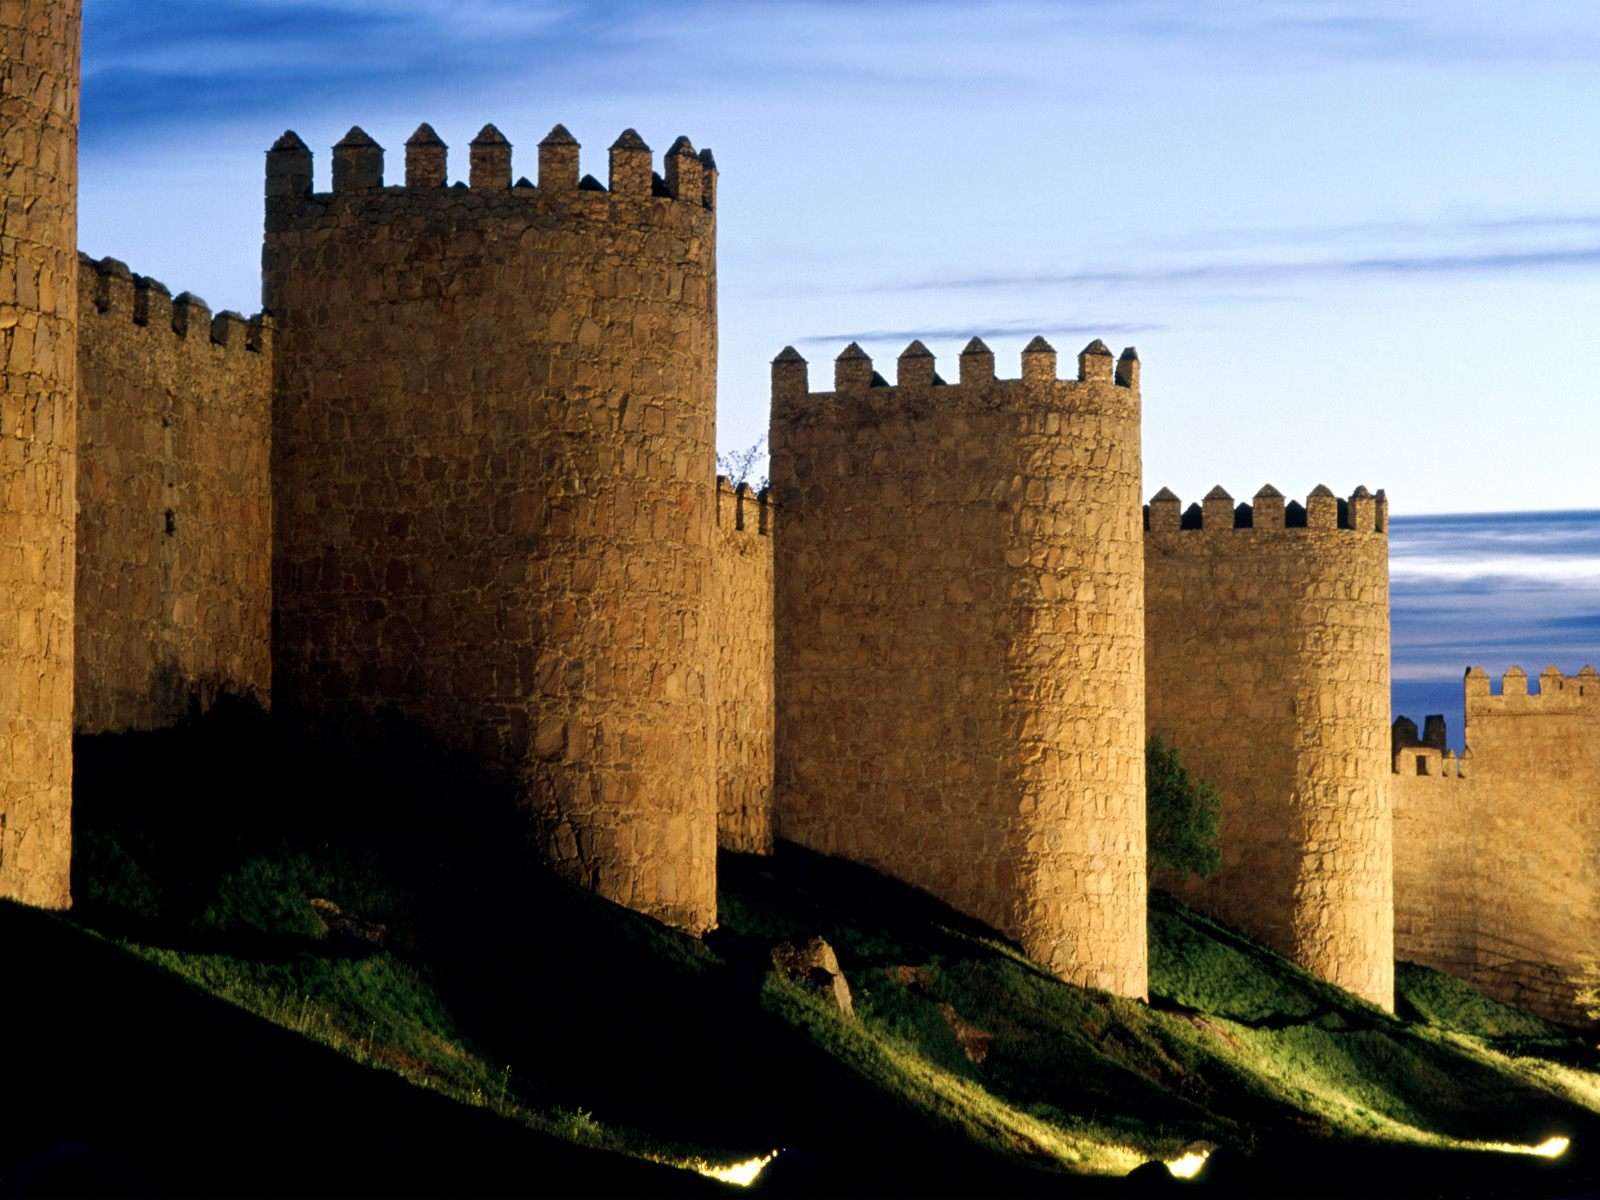 Castle Wallpaper 023